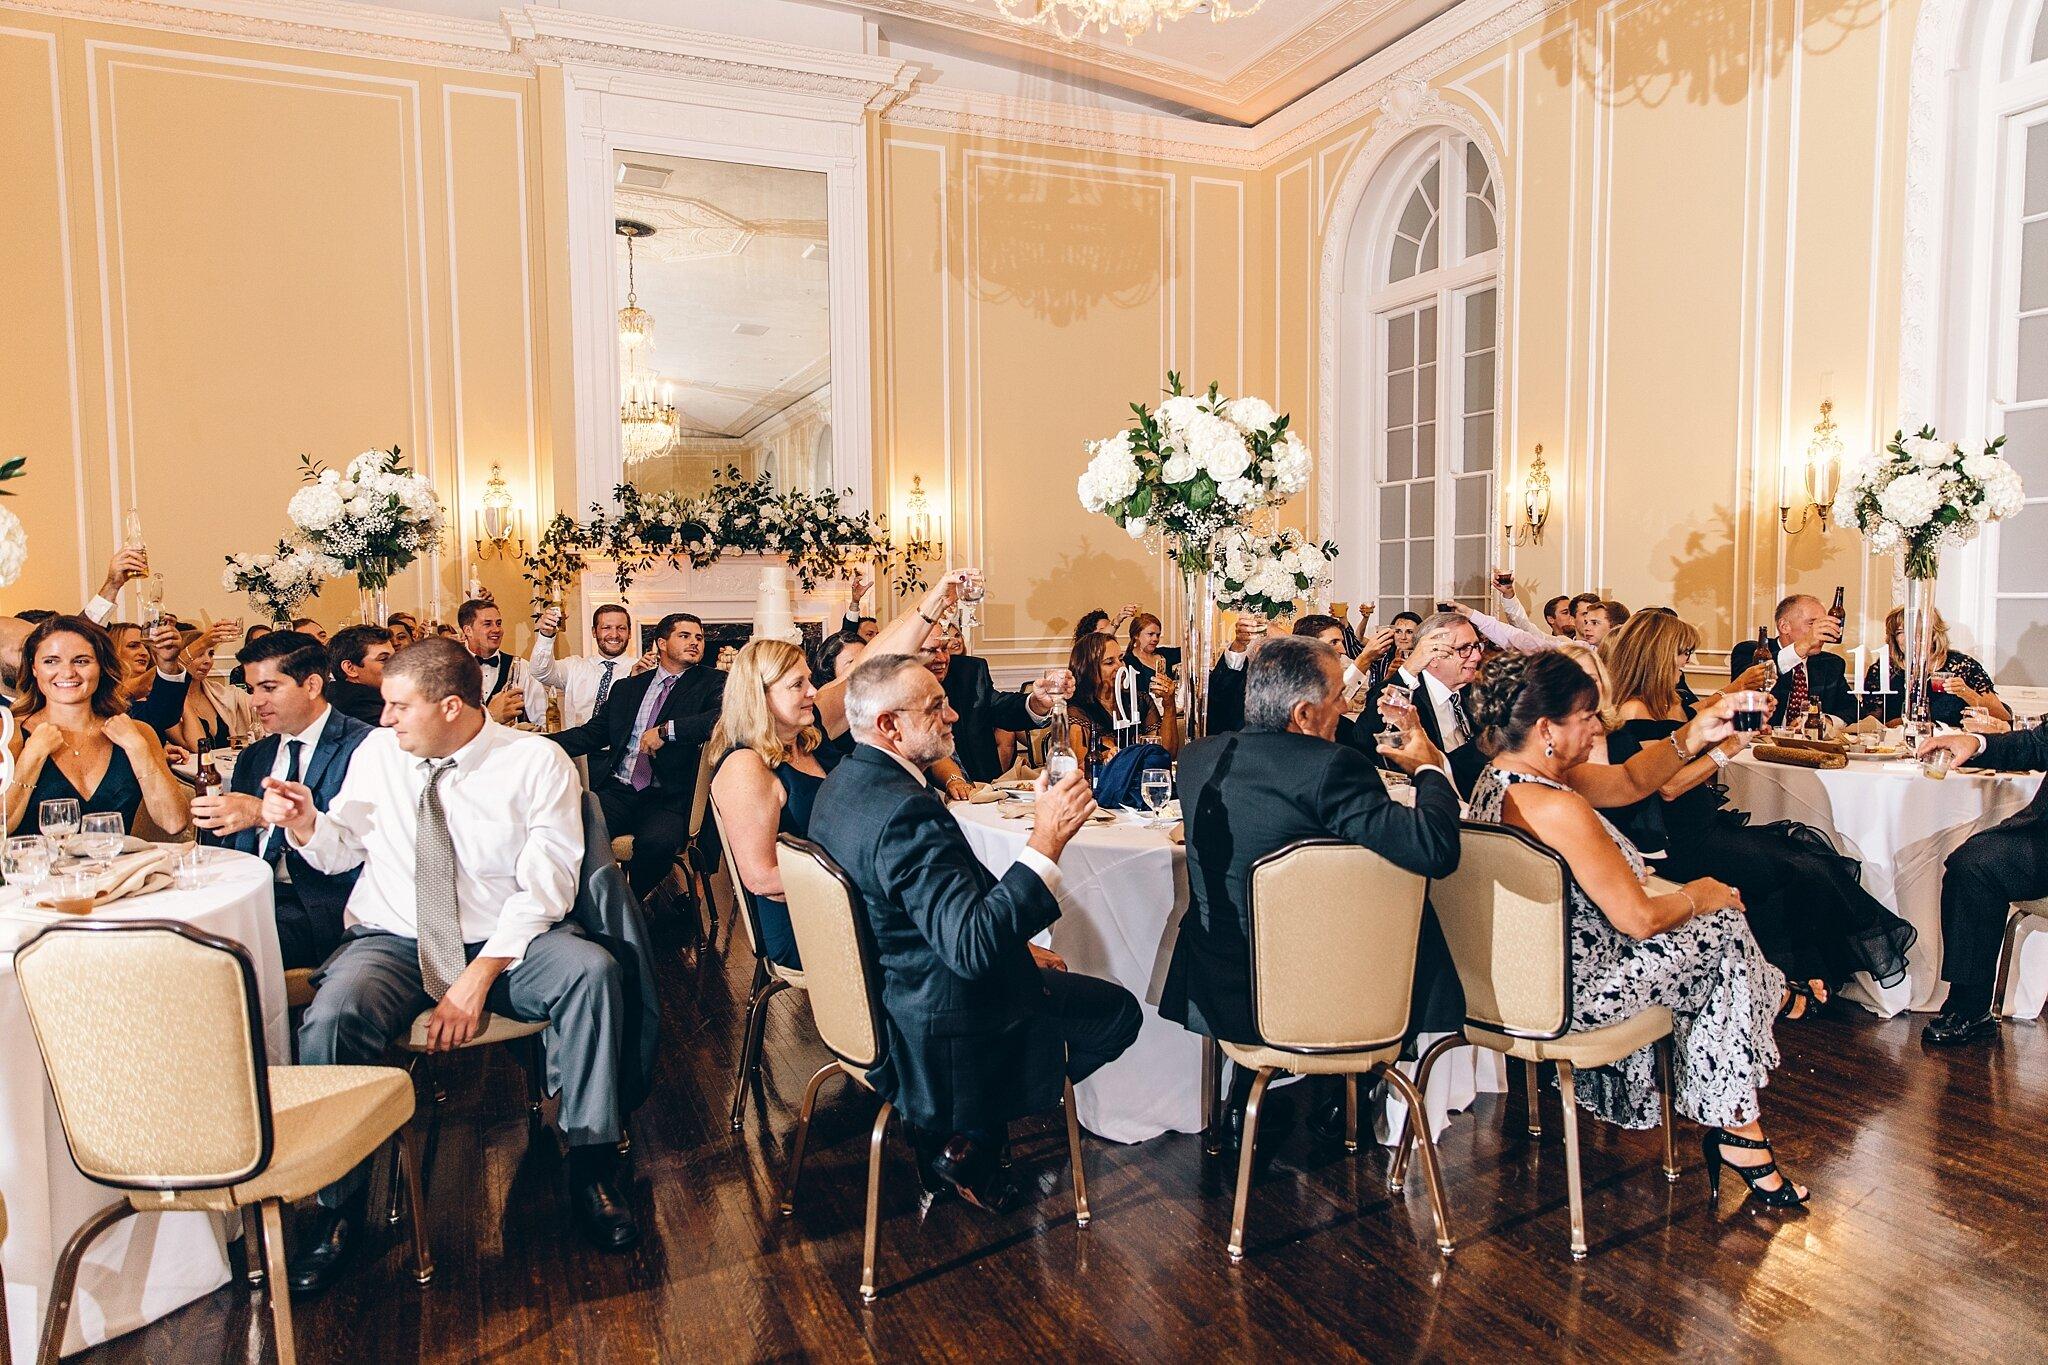 patrick-henry-ballroom-wedding-roanoke_0537.jpg